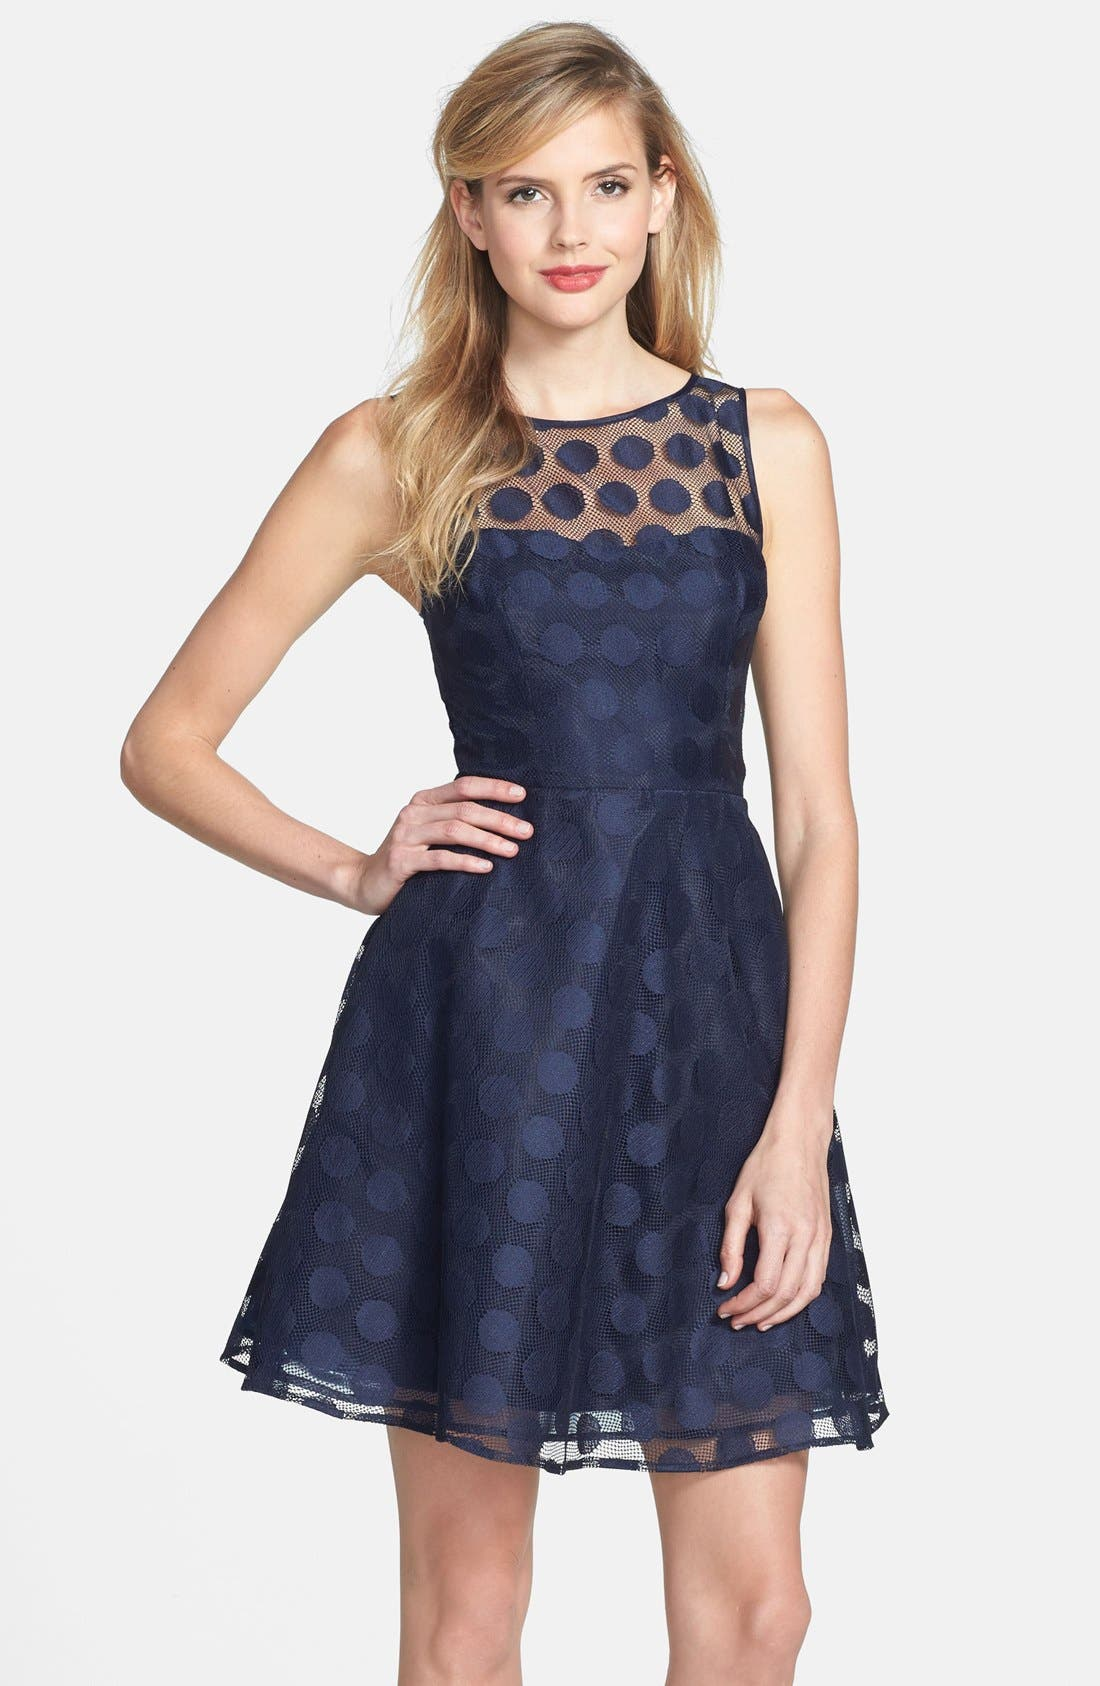 Main Image - Betsey Johnson 'Ivory' Polka Dot Mesh Fit & Flare Dress